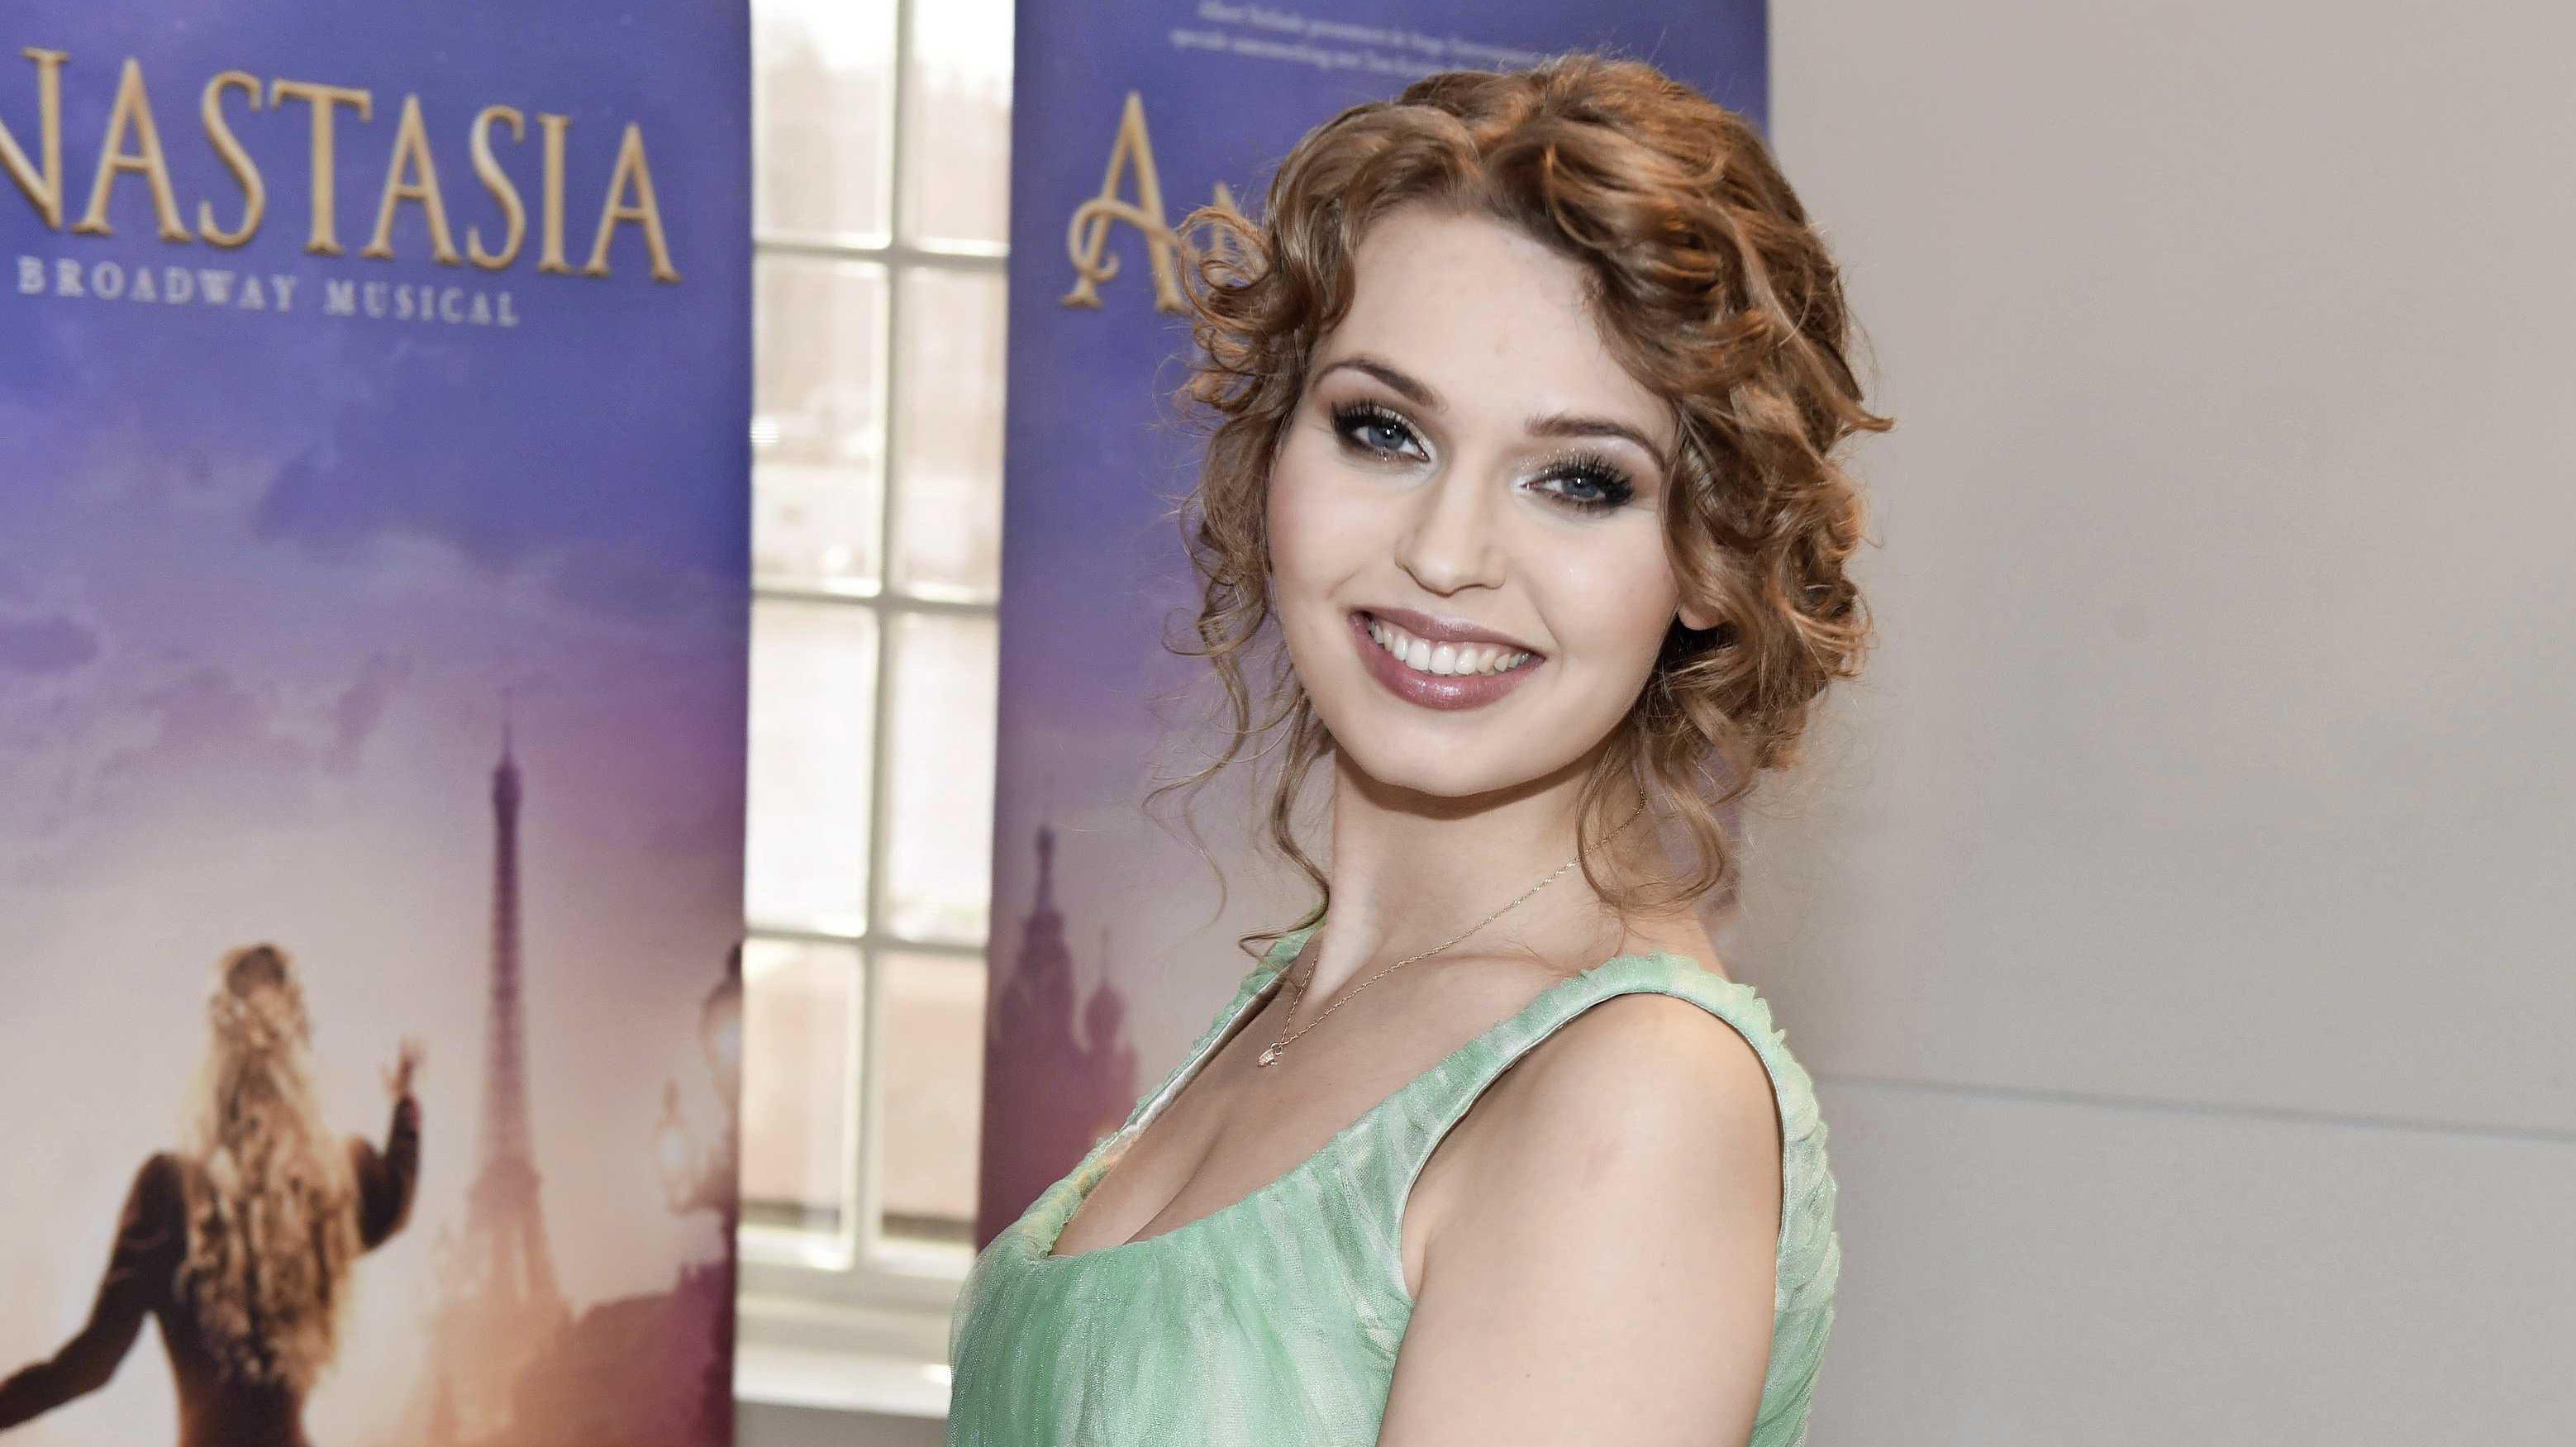 Russische dating site Anastasia